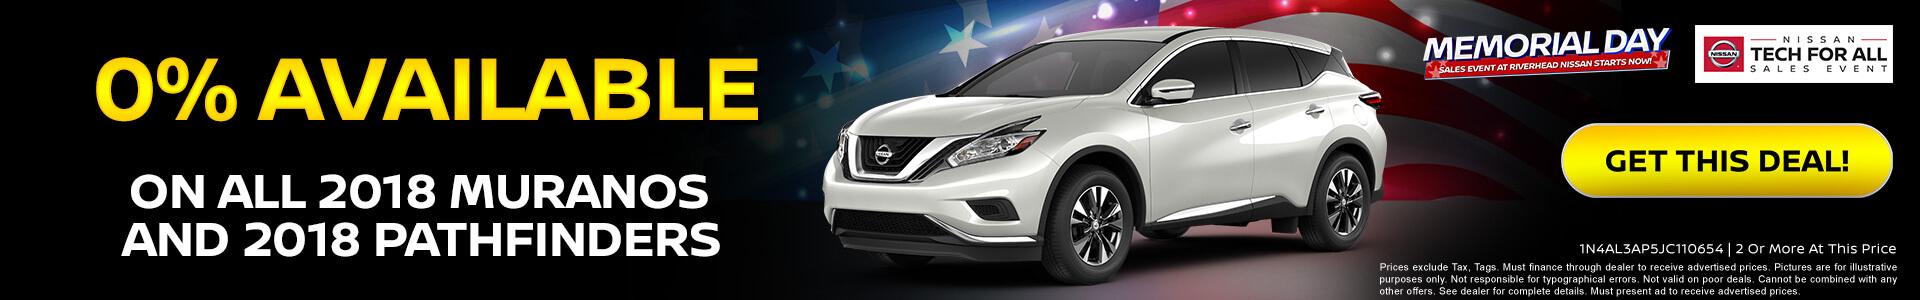 Nissan Pathfinder $249 Lease